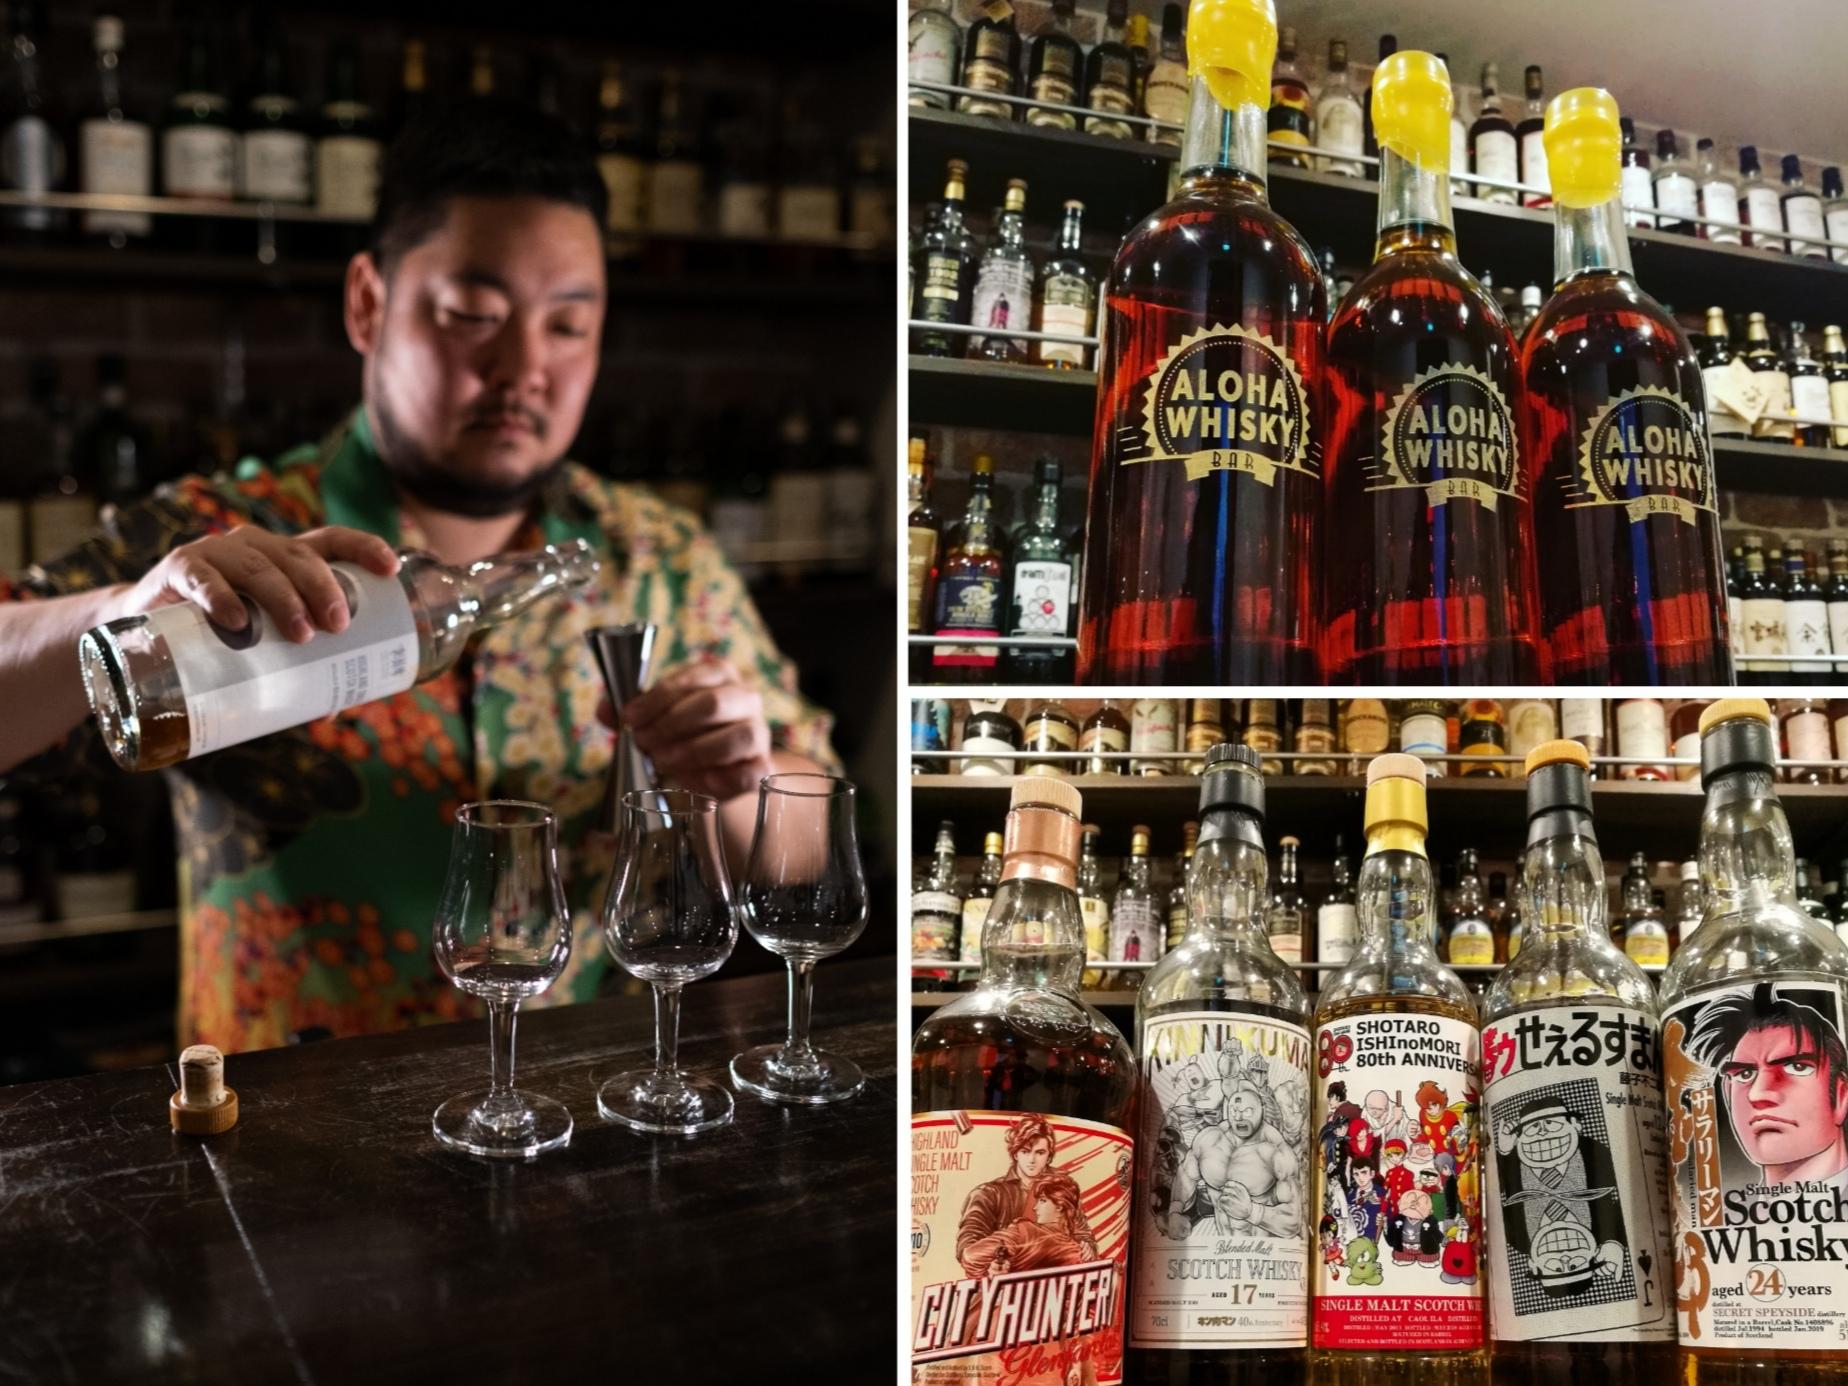 Aloha Whisky Bar owned by David Tsujimoto in Ikebukuro, Tokyo